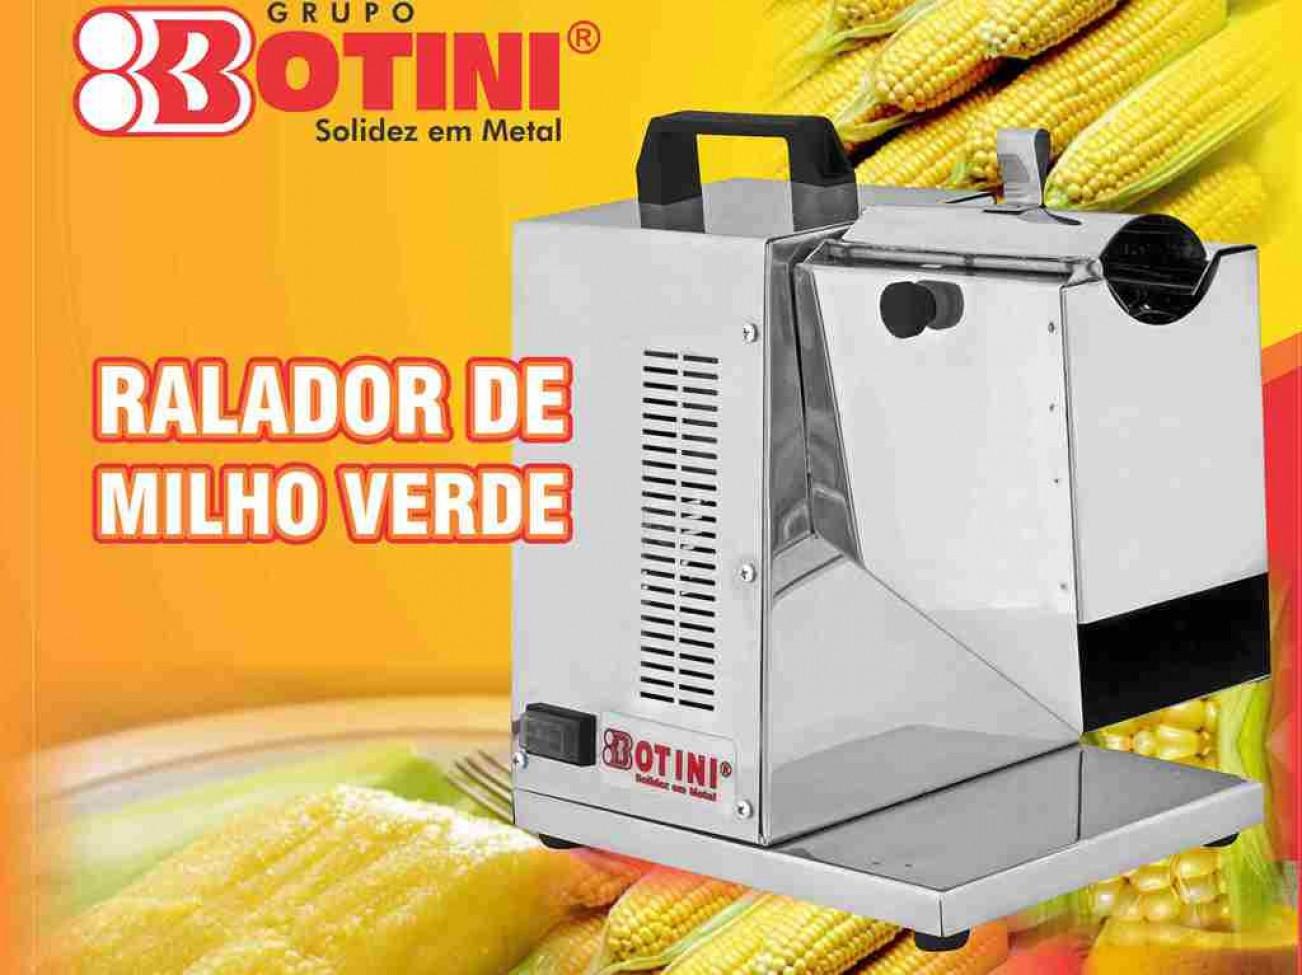 Ralador de Milho Verde Elétrico Motor 1/4cv Bivolt Botini